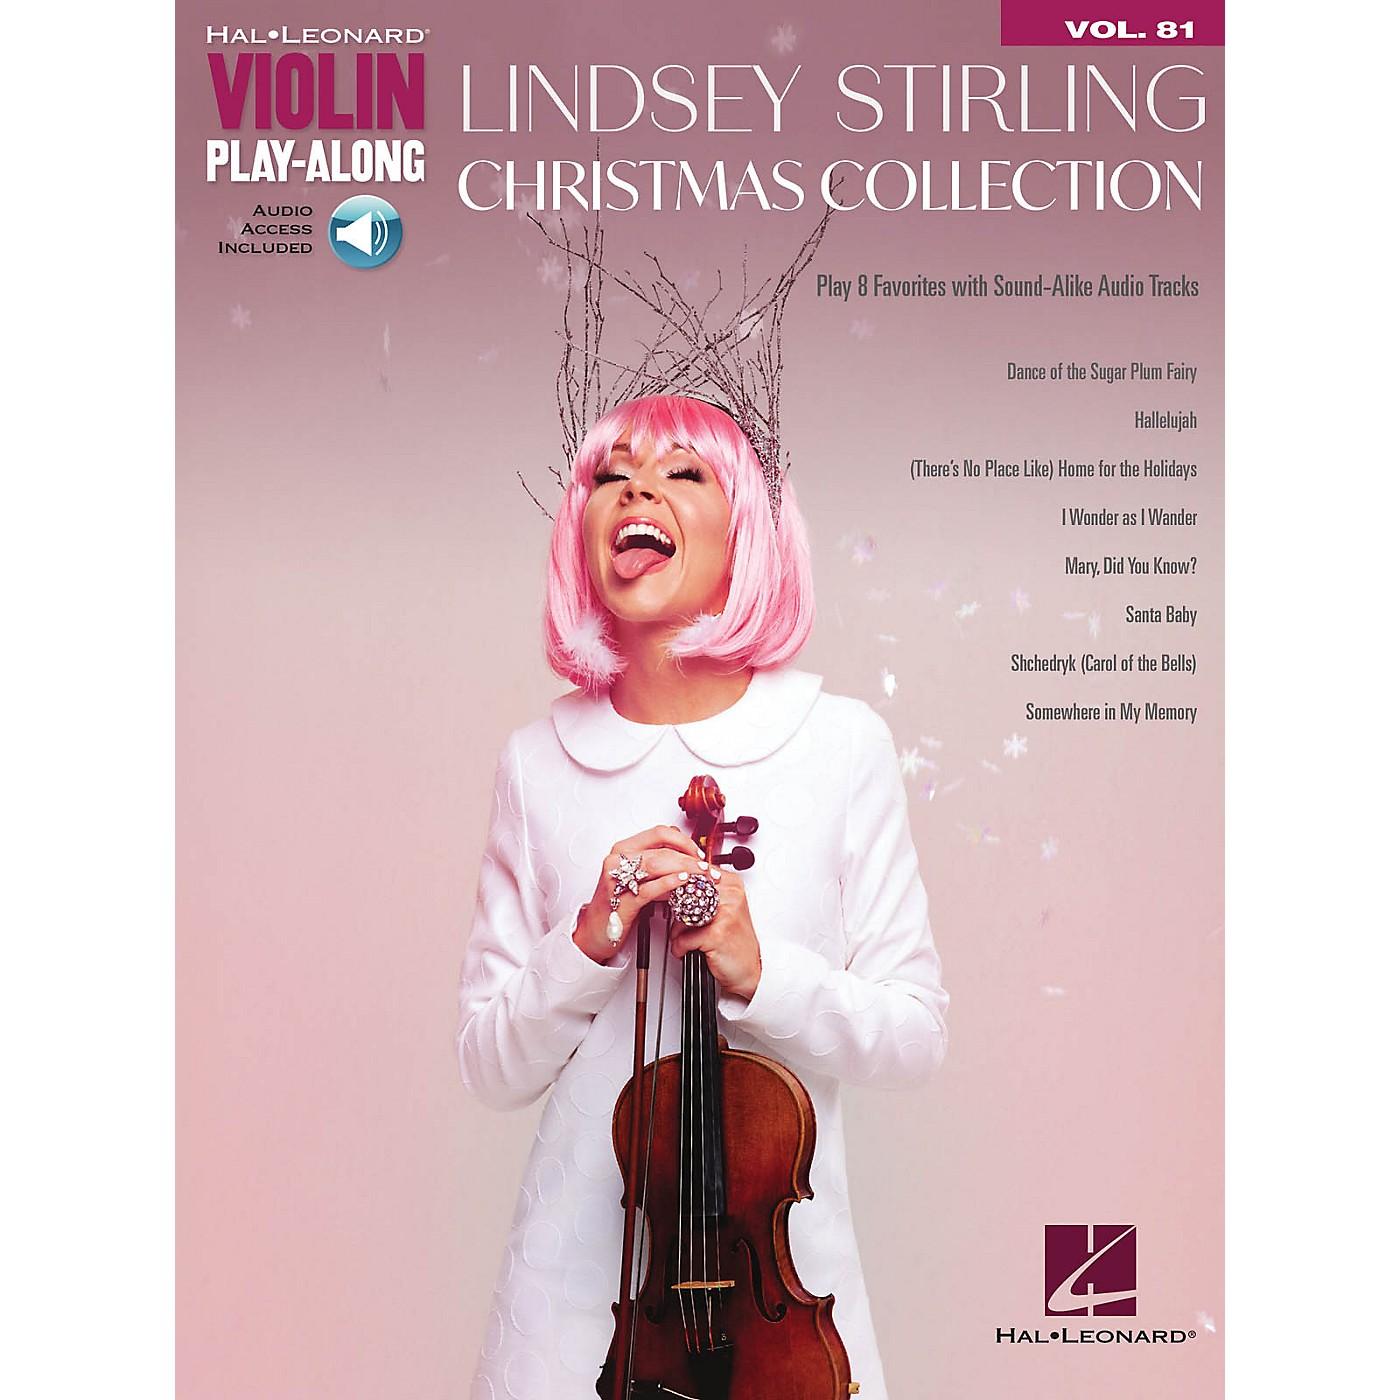 Hal Leonard Lindsey Stirling - Christmas Collection Violin Play-Along Volume 81 Book/Audio Online thumbnail